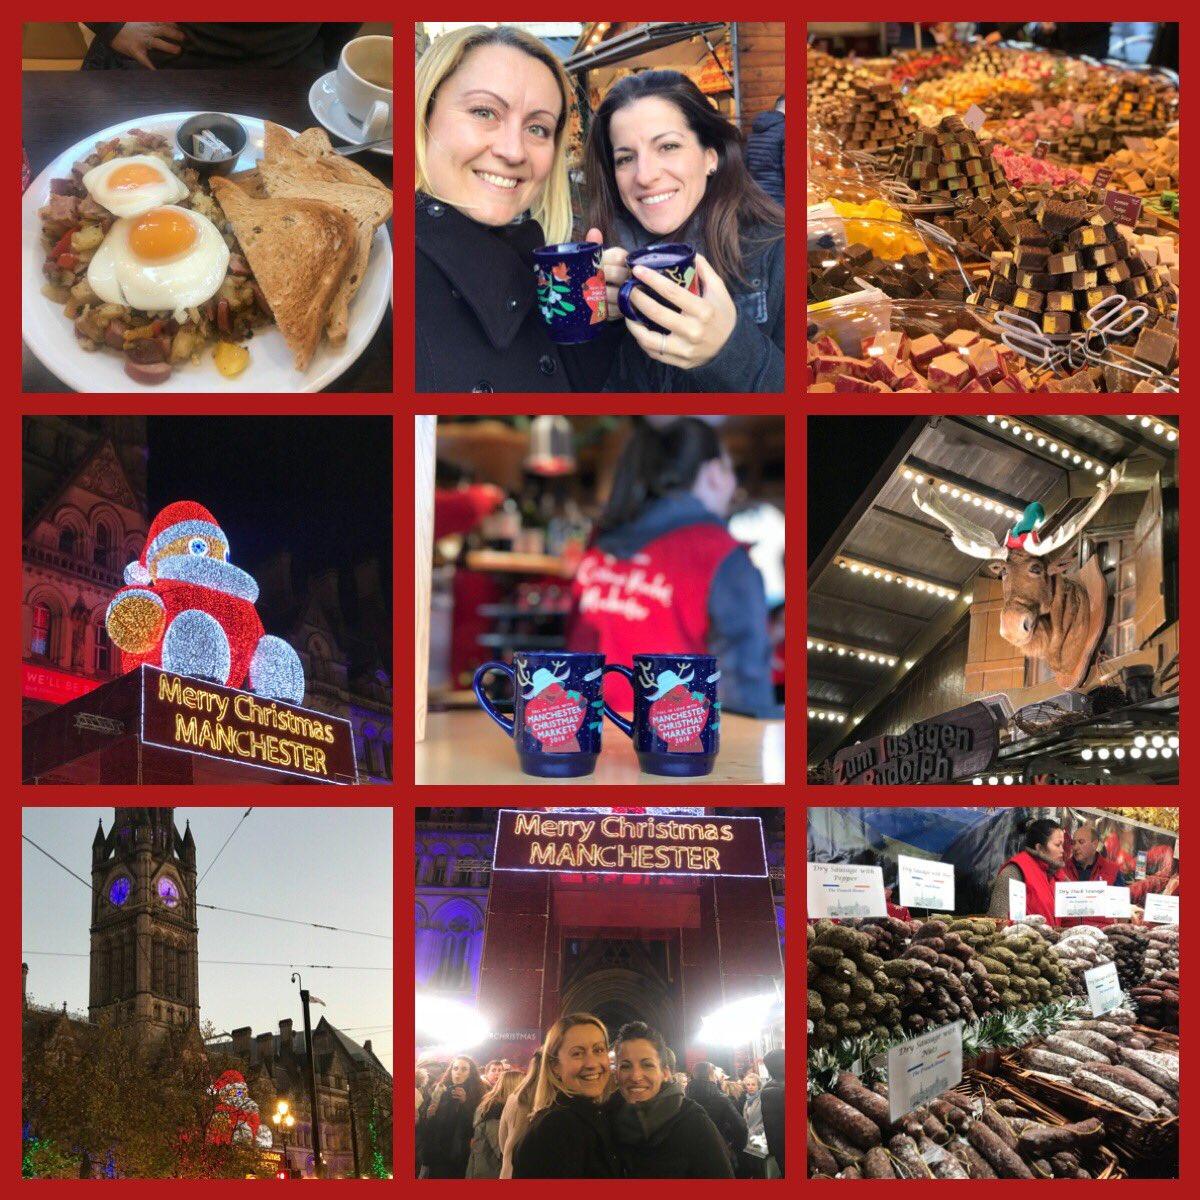 Manchester Christmas Markets 2018 🎄❄️🎅🏻❤️ #MCRCHRISTMAS https://t.co/CgbFOy83Ks